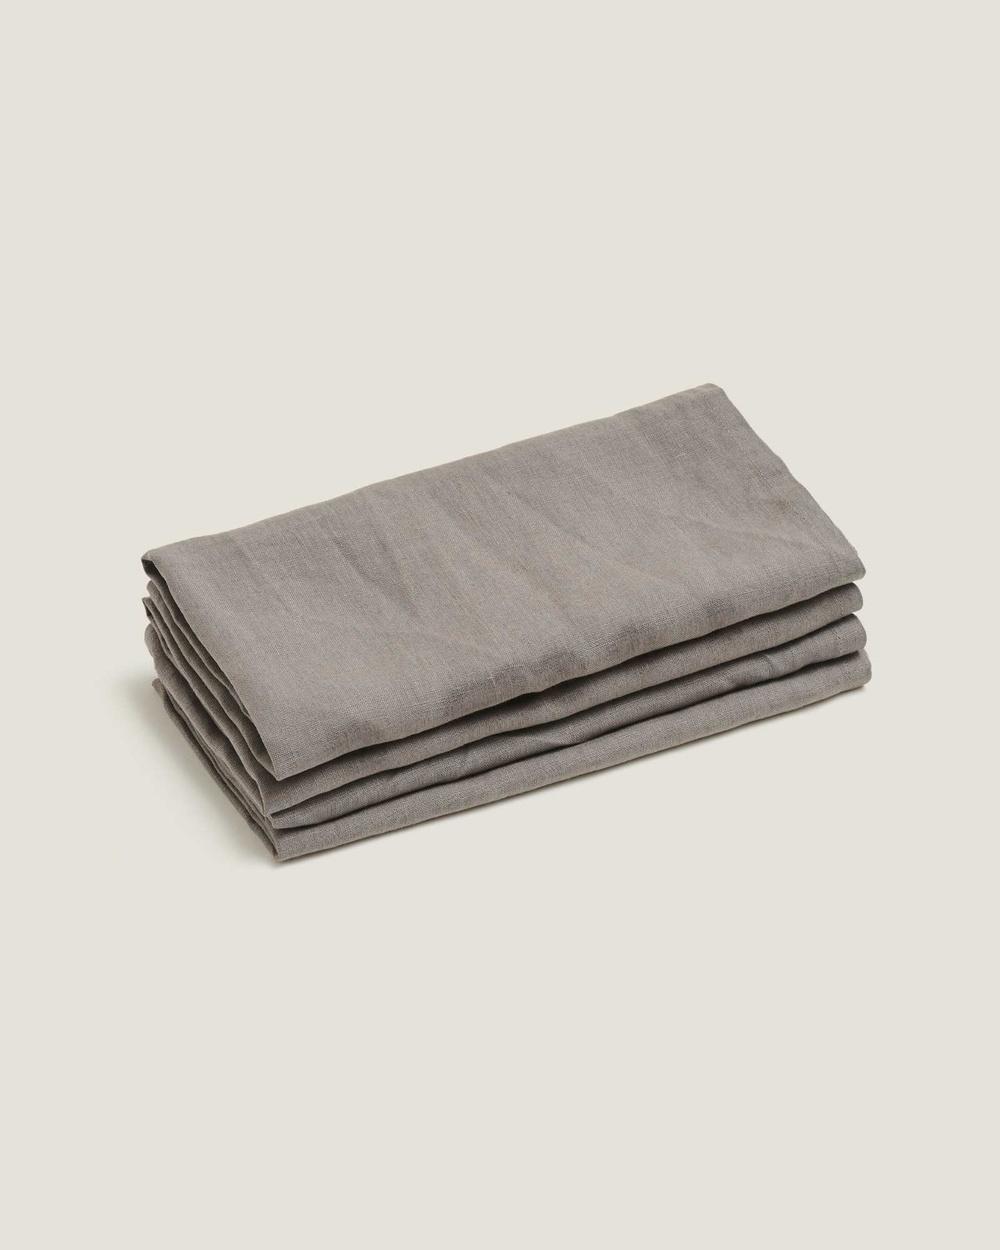 Carlotta + Gee 100% Linen Napkin Set Home Grey Australia